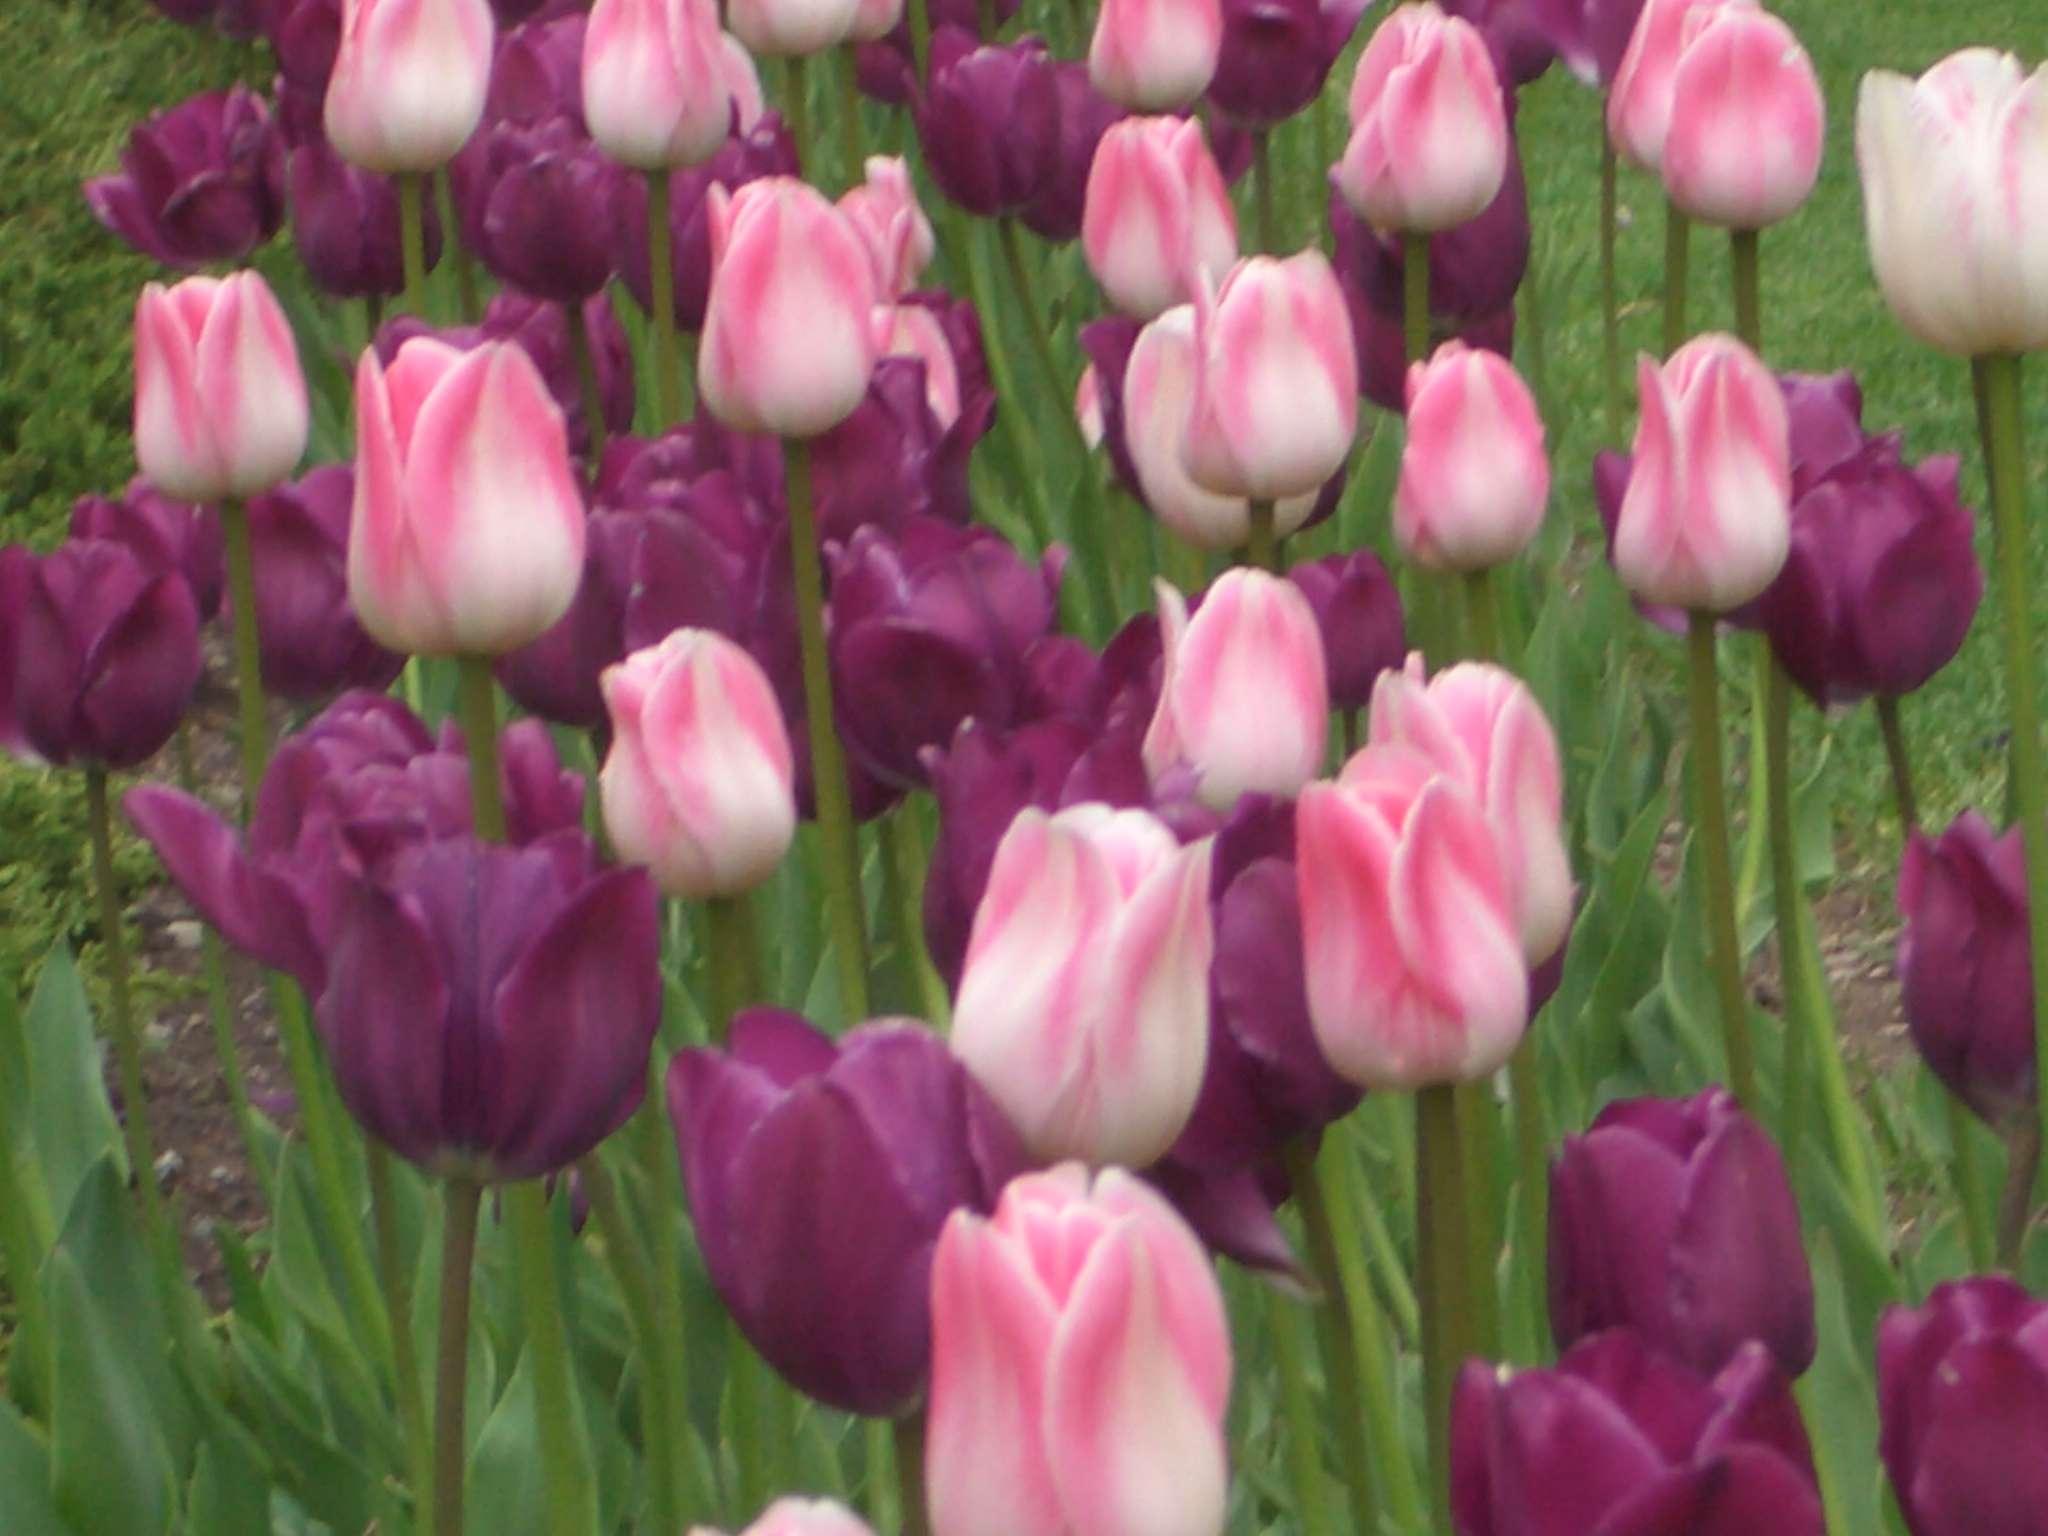 Tulips PurplePink HD Wallpapers Picturenixcom 2048x1536